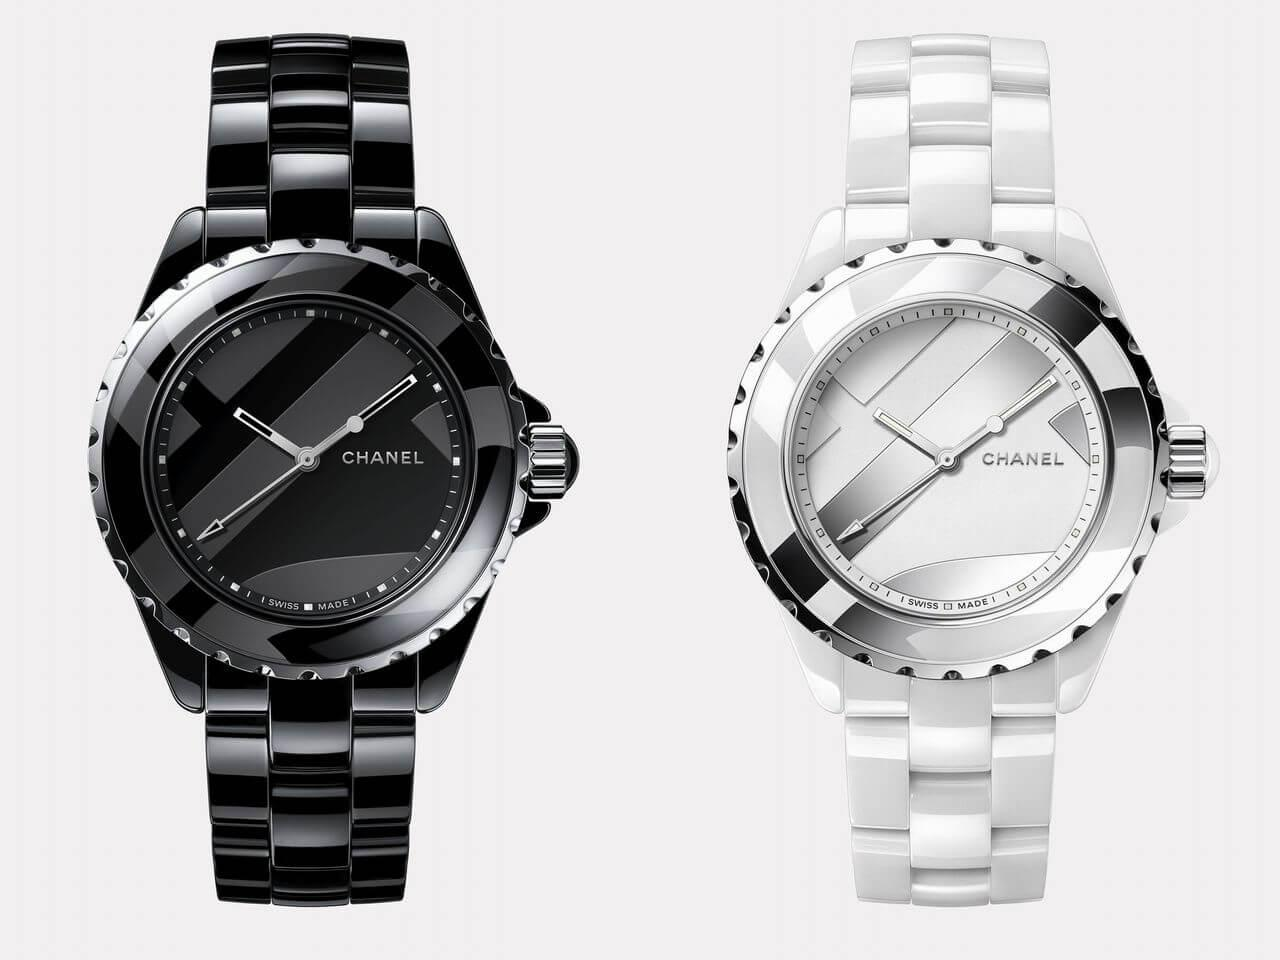 purchase cheap 75c29 190b2 シャネル2018年新作【バーゼルワールド2018】腕時計情報 ピアゾ ...